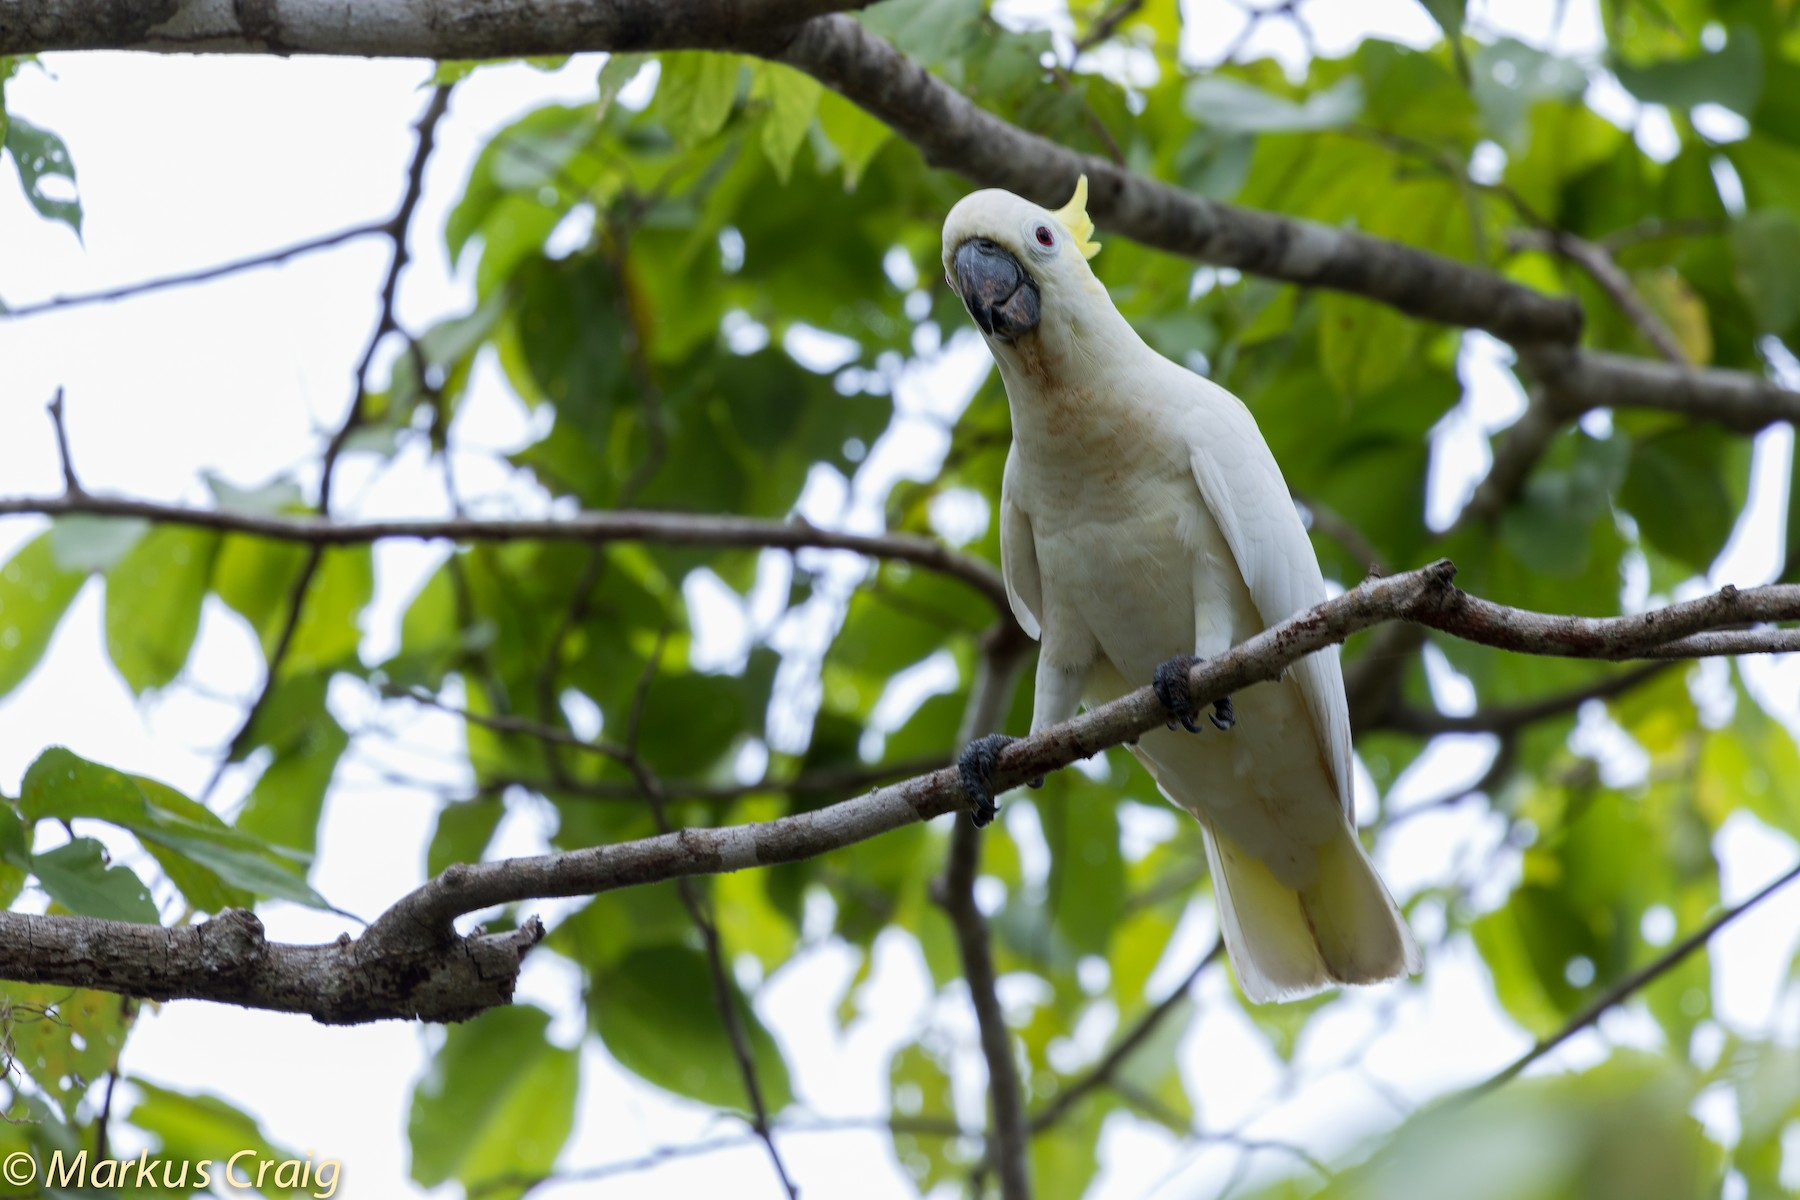 Yellow-crested Cockatoo - Markus Craig